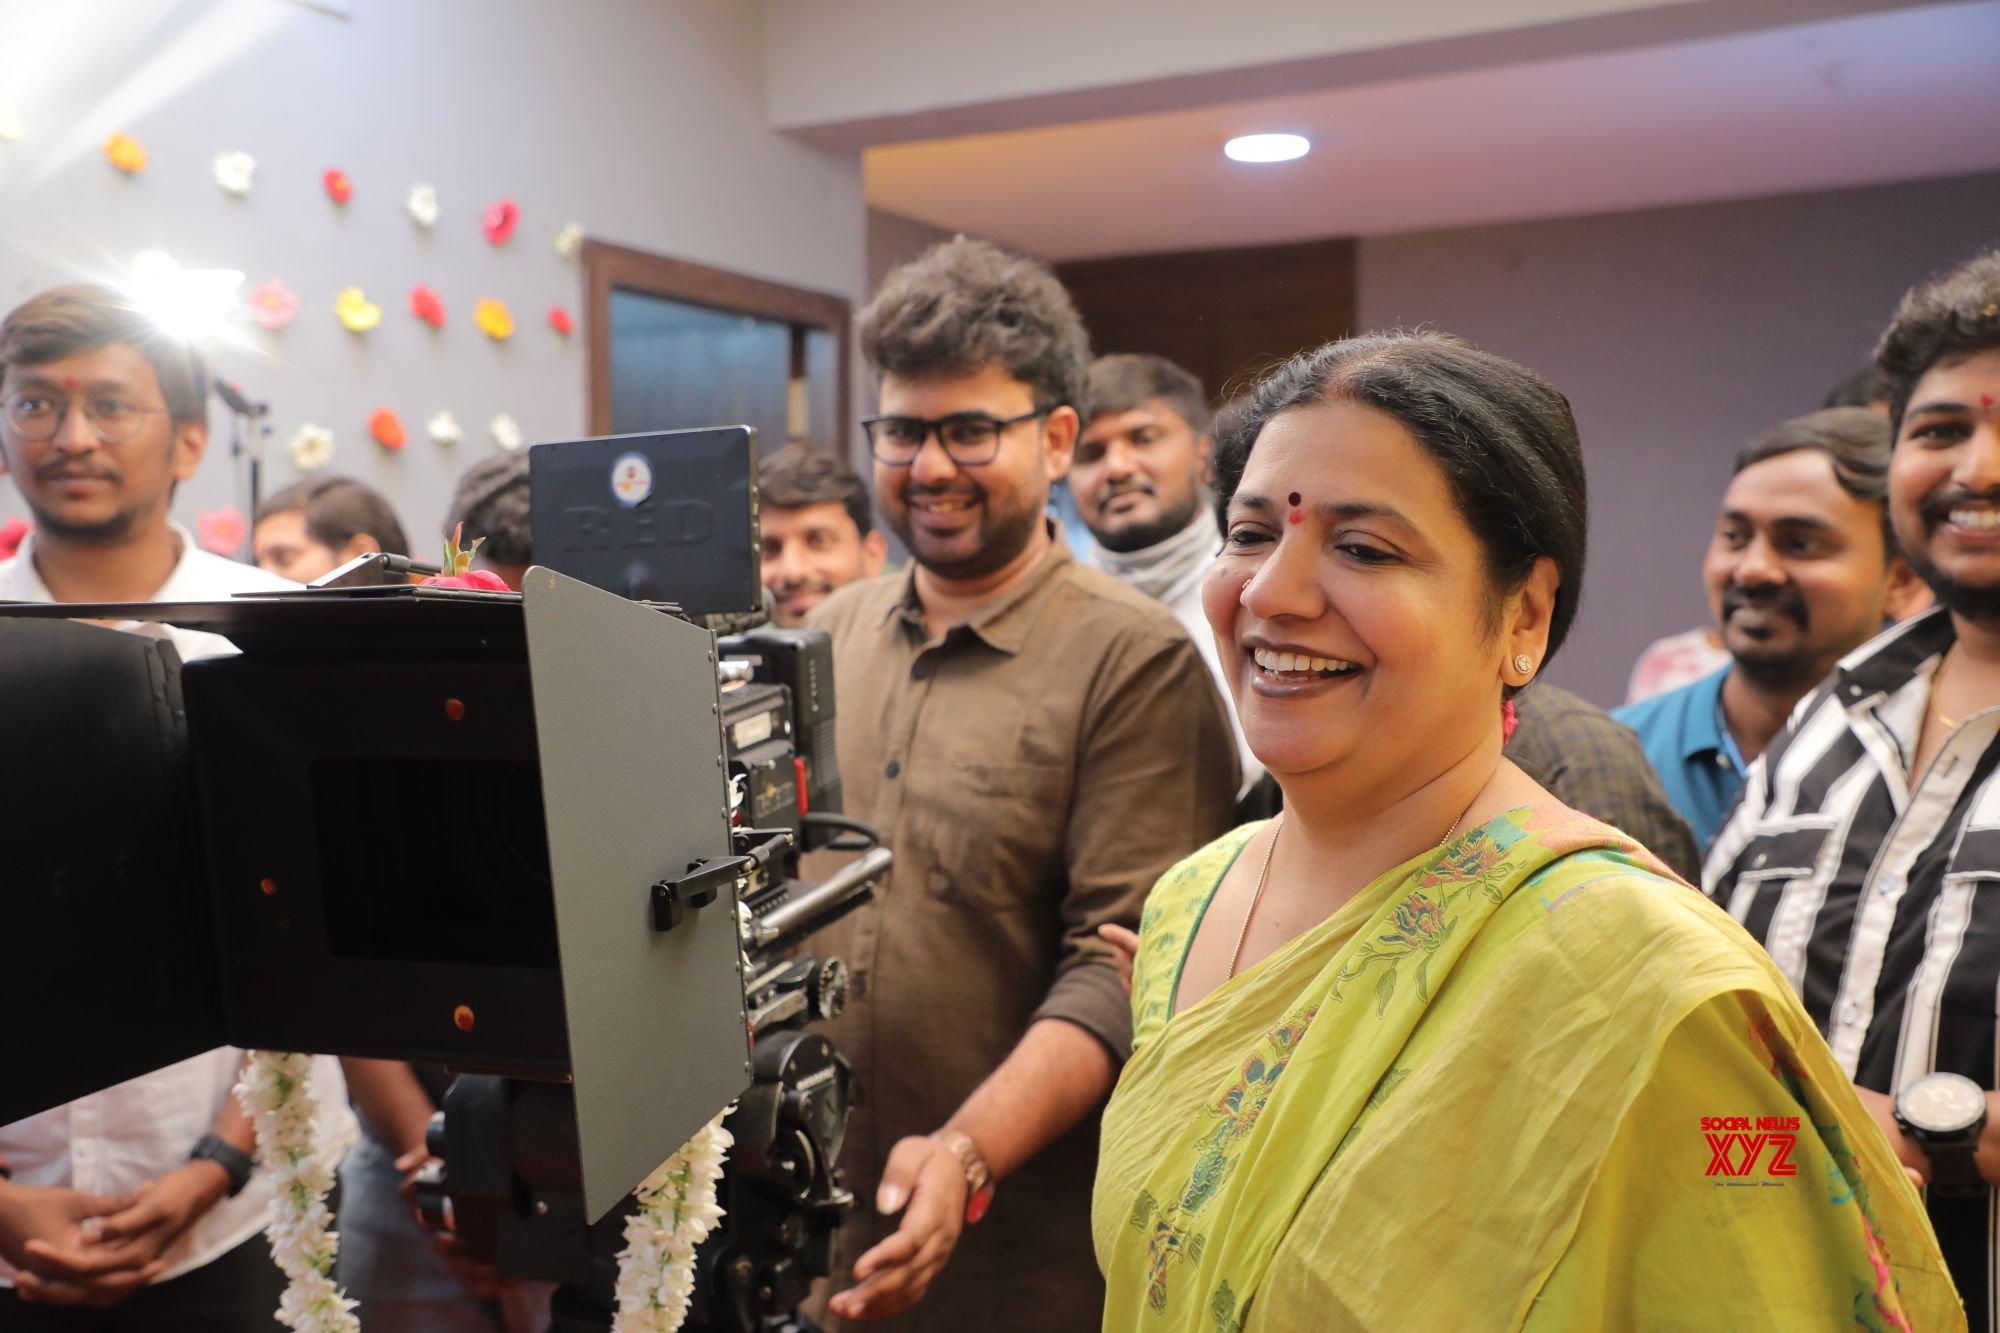 'Padma Shri' Brahmanandam, Rahul Vijay and Naresh Agastya-starrer launched by Ticket Factory & S Originals as Production No. 1